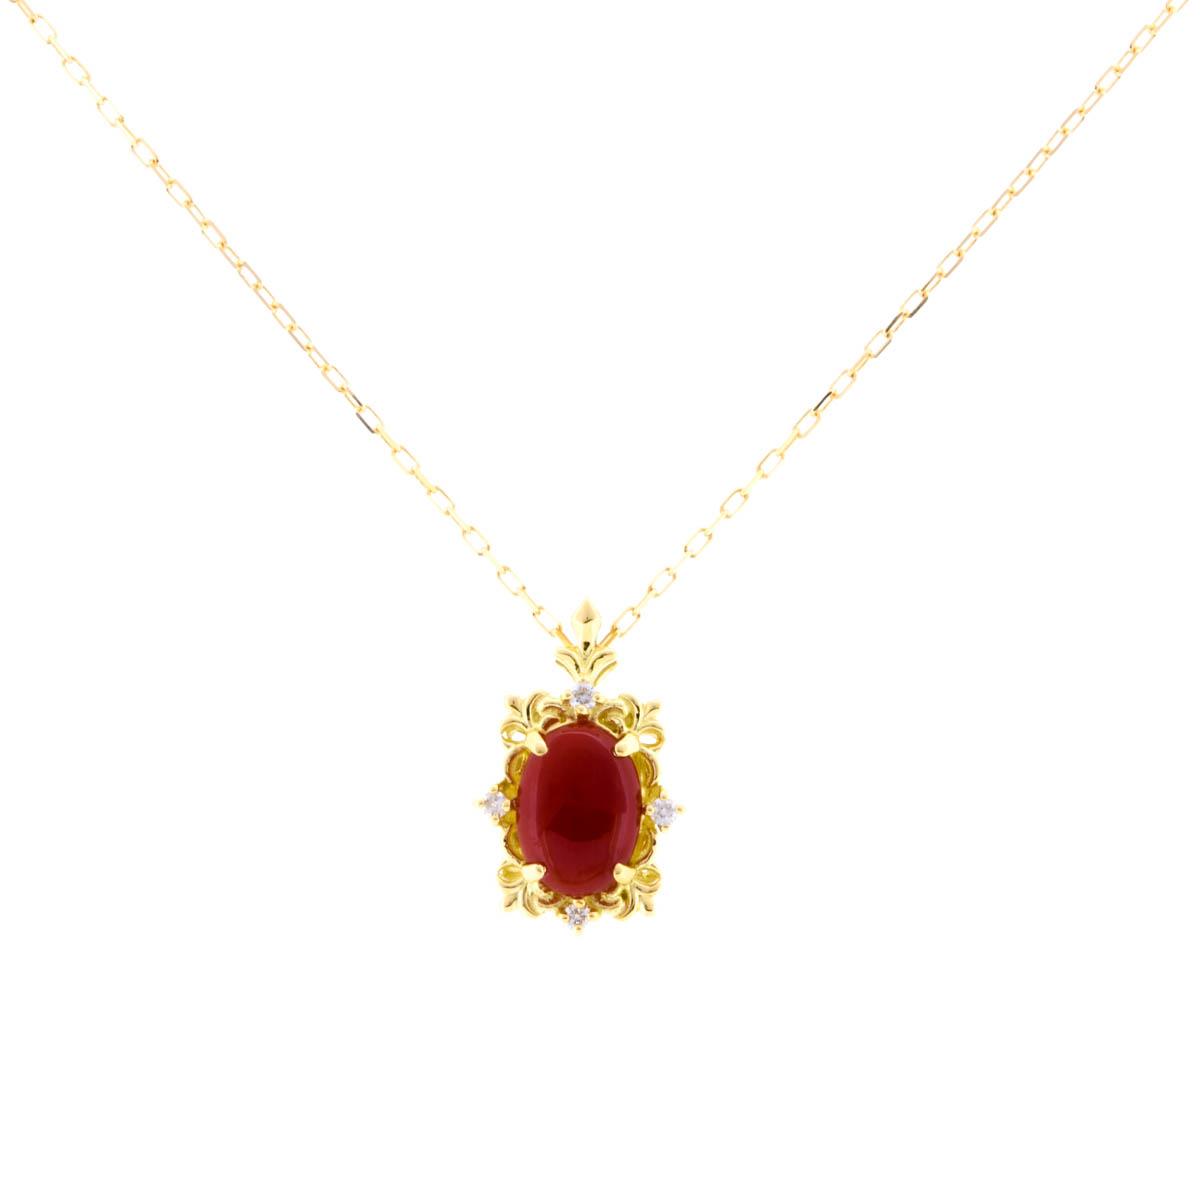 K18YG 赤珊瑚 ペンダント ネックレス 唐草